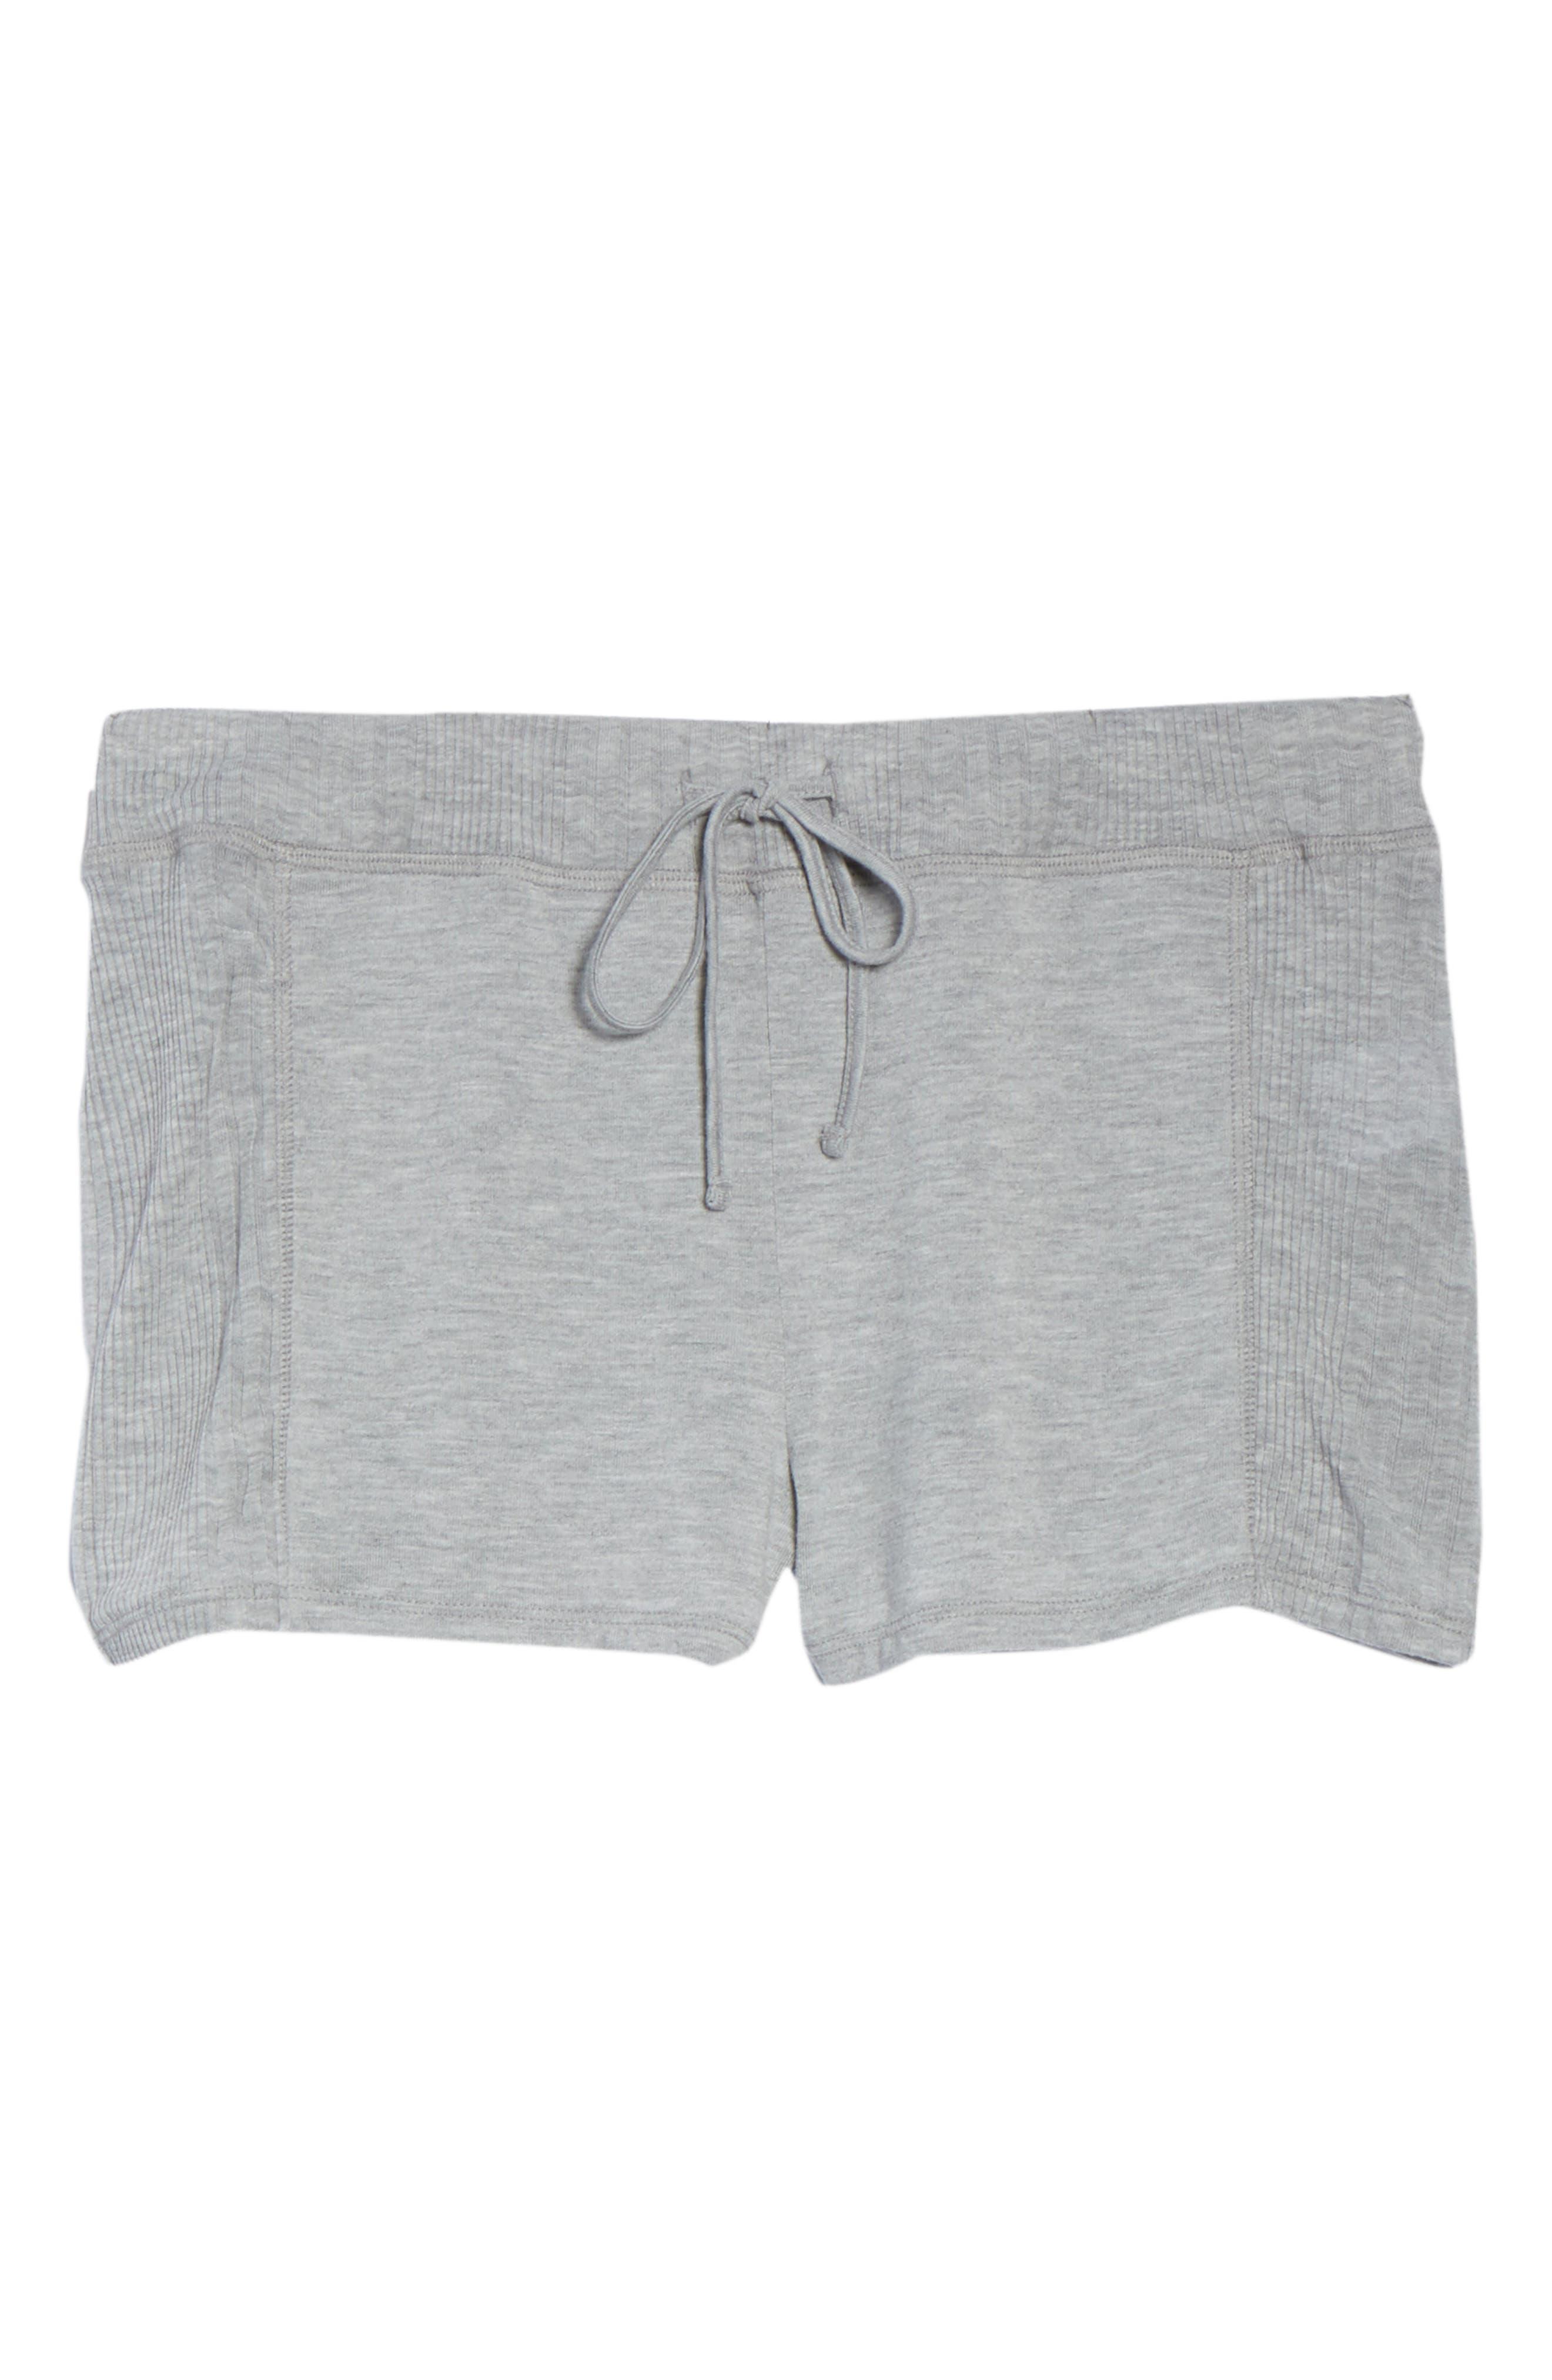 Pajama Shorts,                             Alternate thumbnail 6, color,                             LIGHT HEATHER GREY